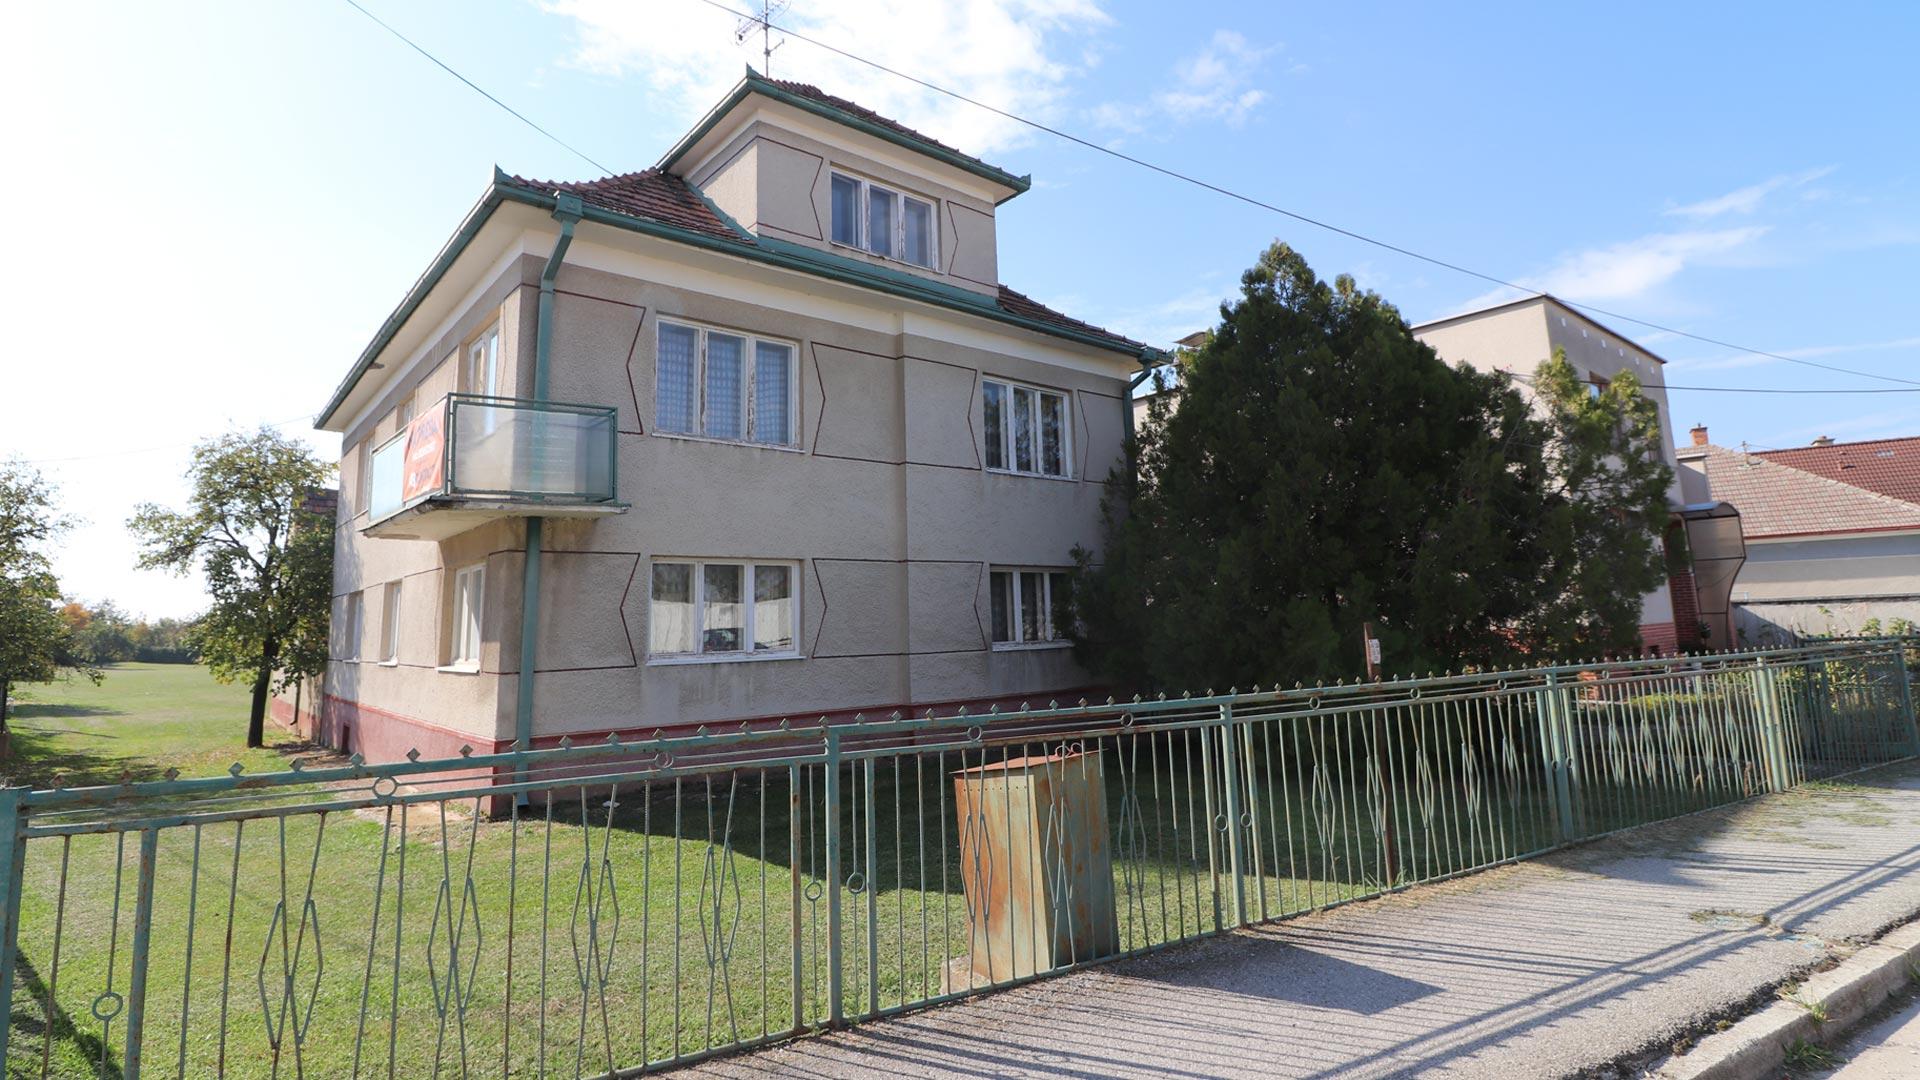 Dom na peknom pozemku za cenu hrubej stavby